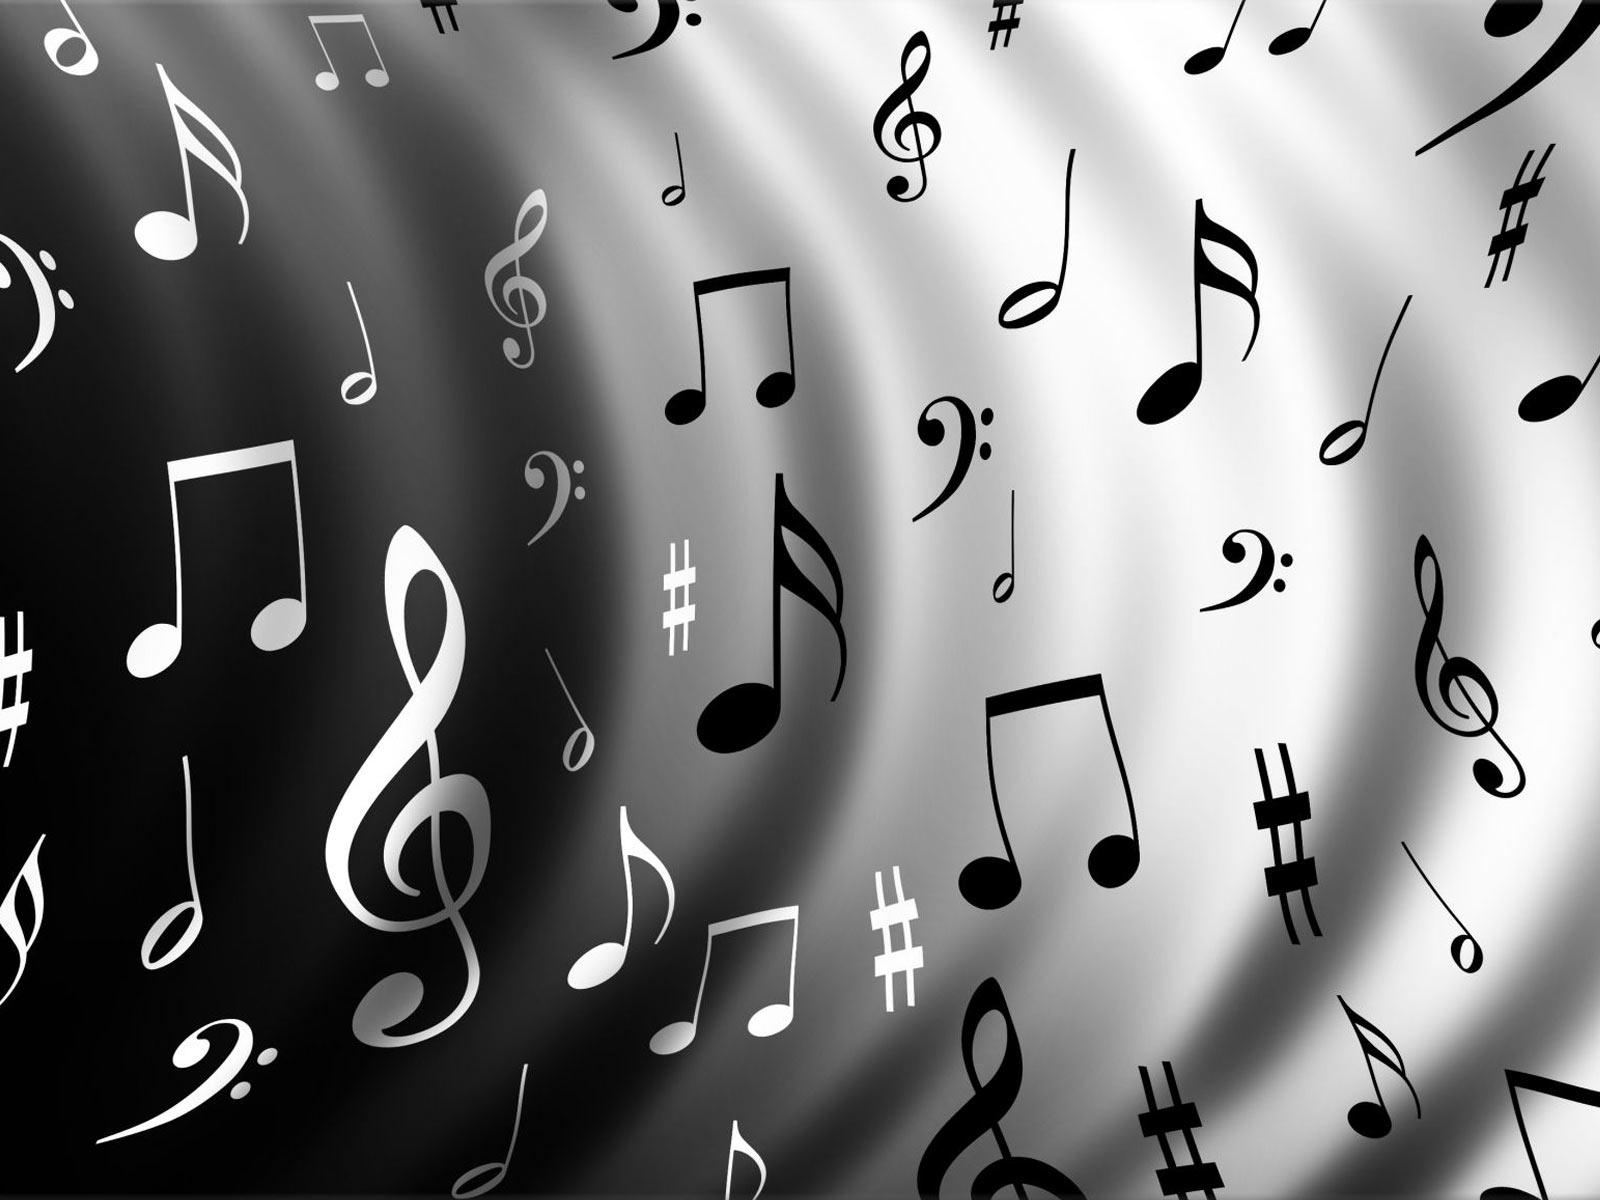 http://1.bp.blogspot.com/_fGfxzT8Q-4U/S9CoeXT7o-I/AAAAAAAAAX8/hYveHkNuQEs/s1600/Music_Notes.jpg